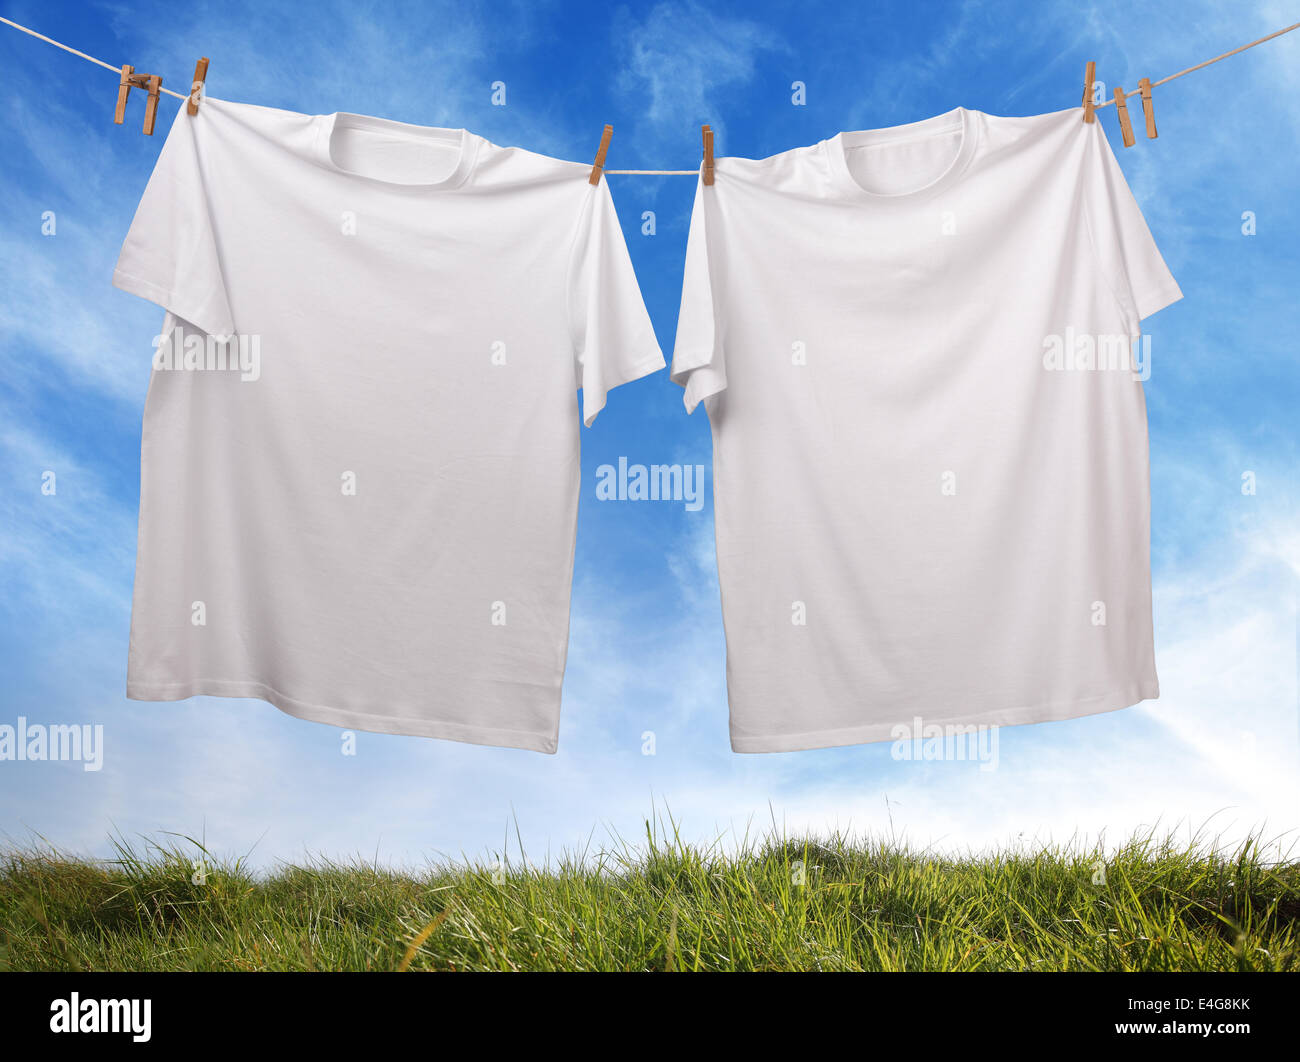 Blank white t-shirt hanging on clothesline - Stock Image